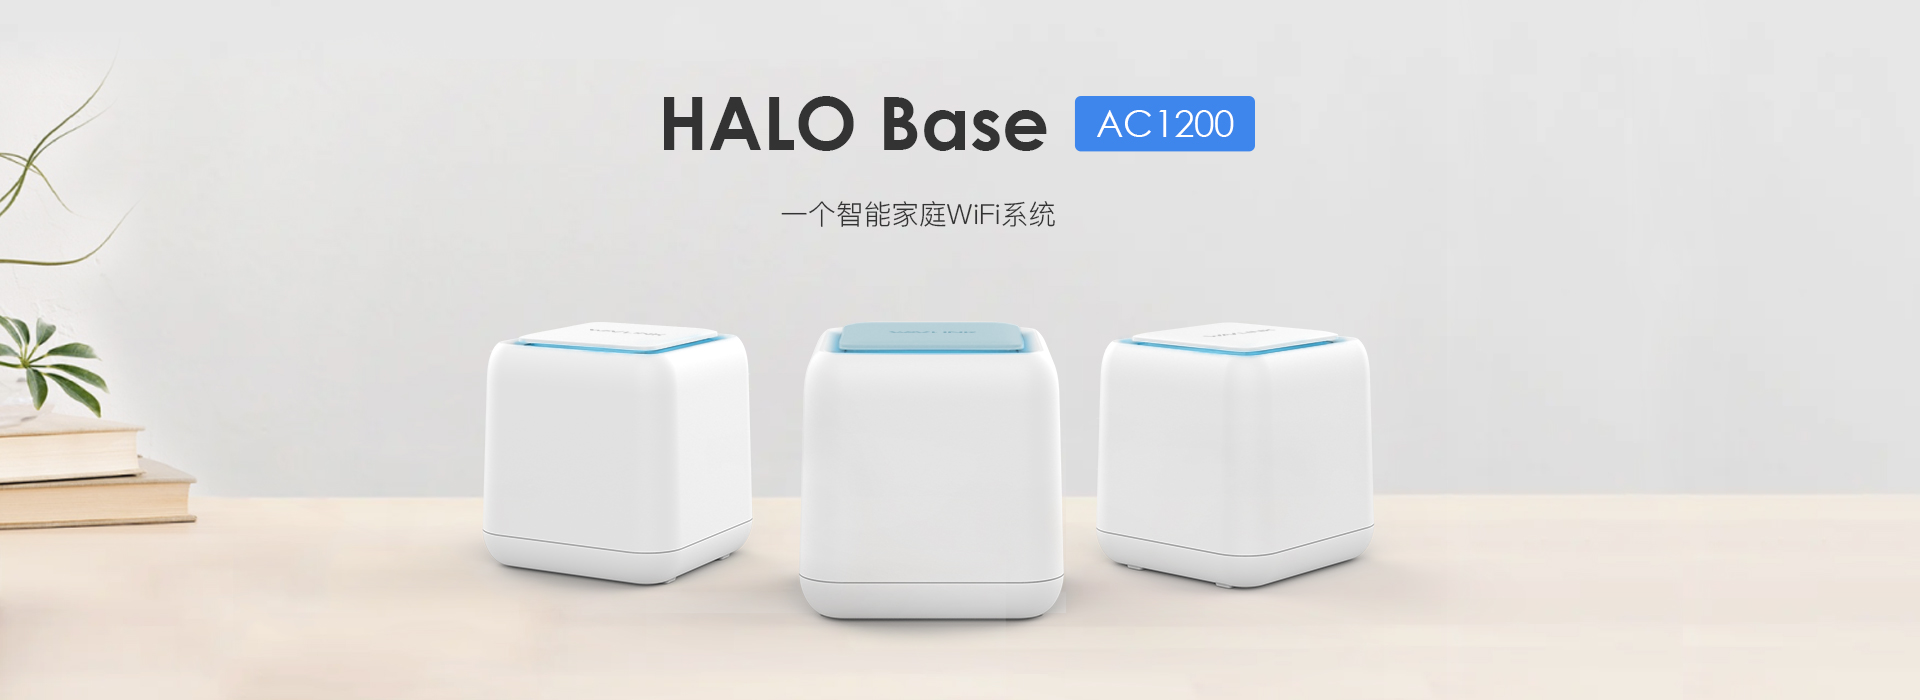 HALO Base - 1200Mbps双频千兆分布式路由